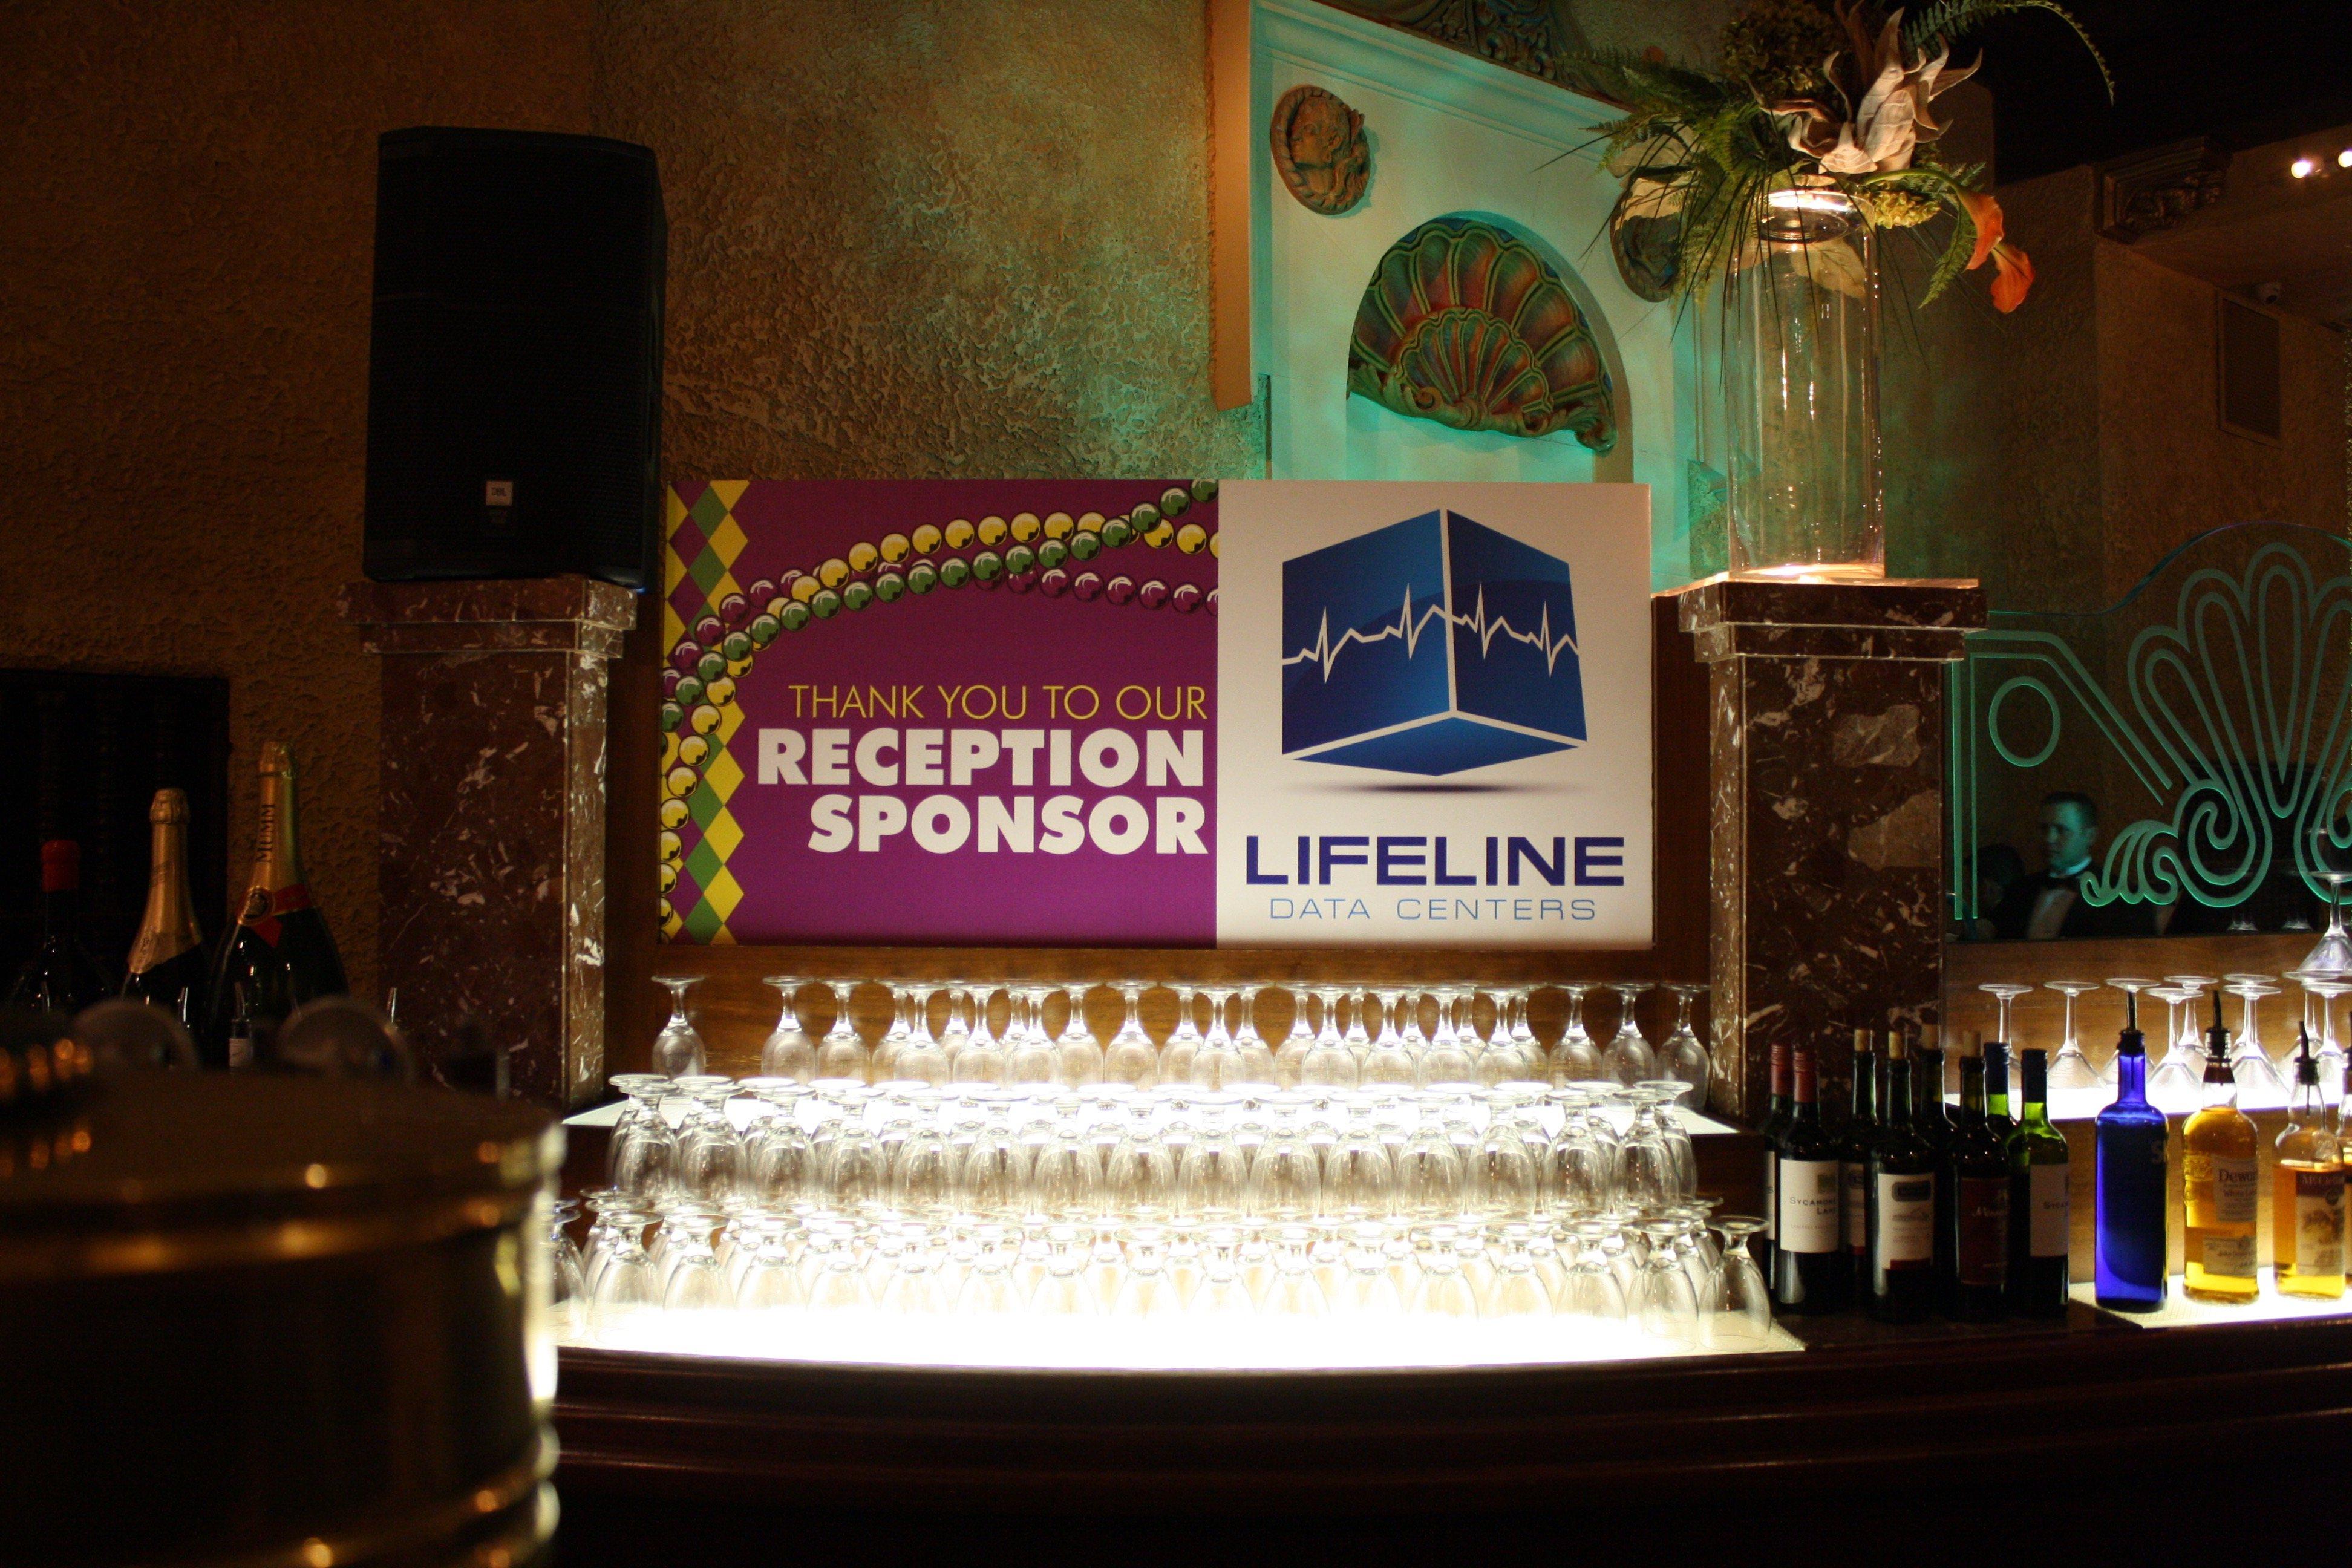 Lifeline Sponsored Reception